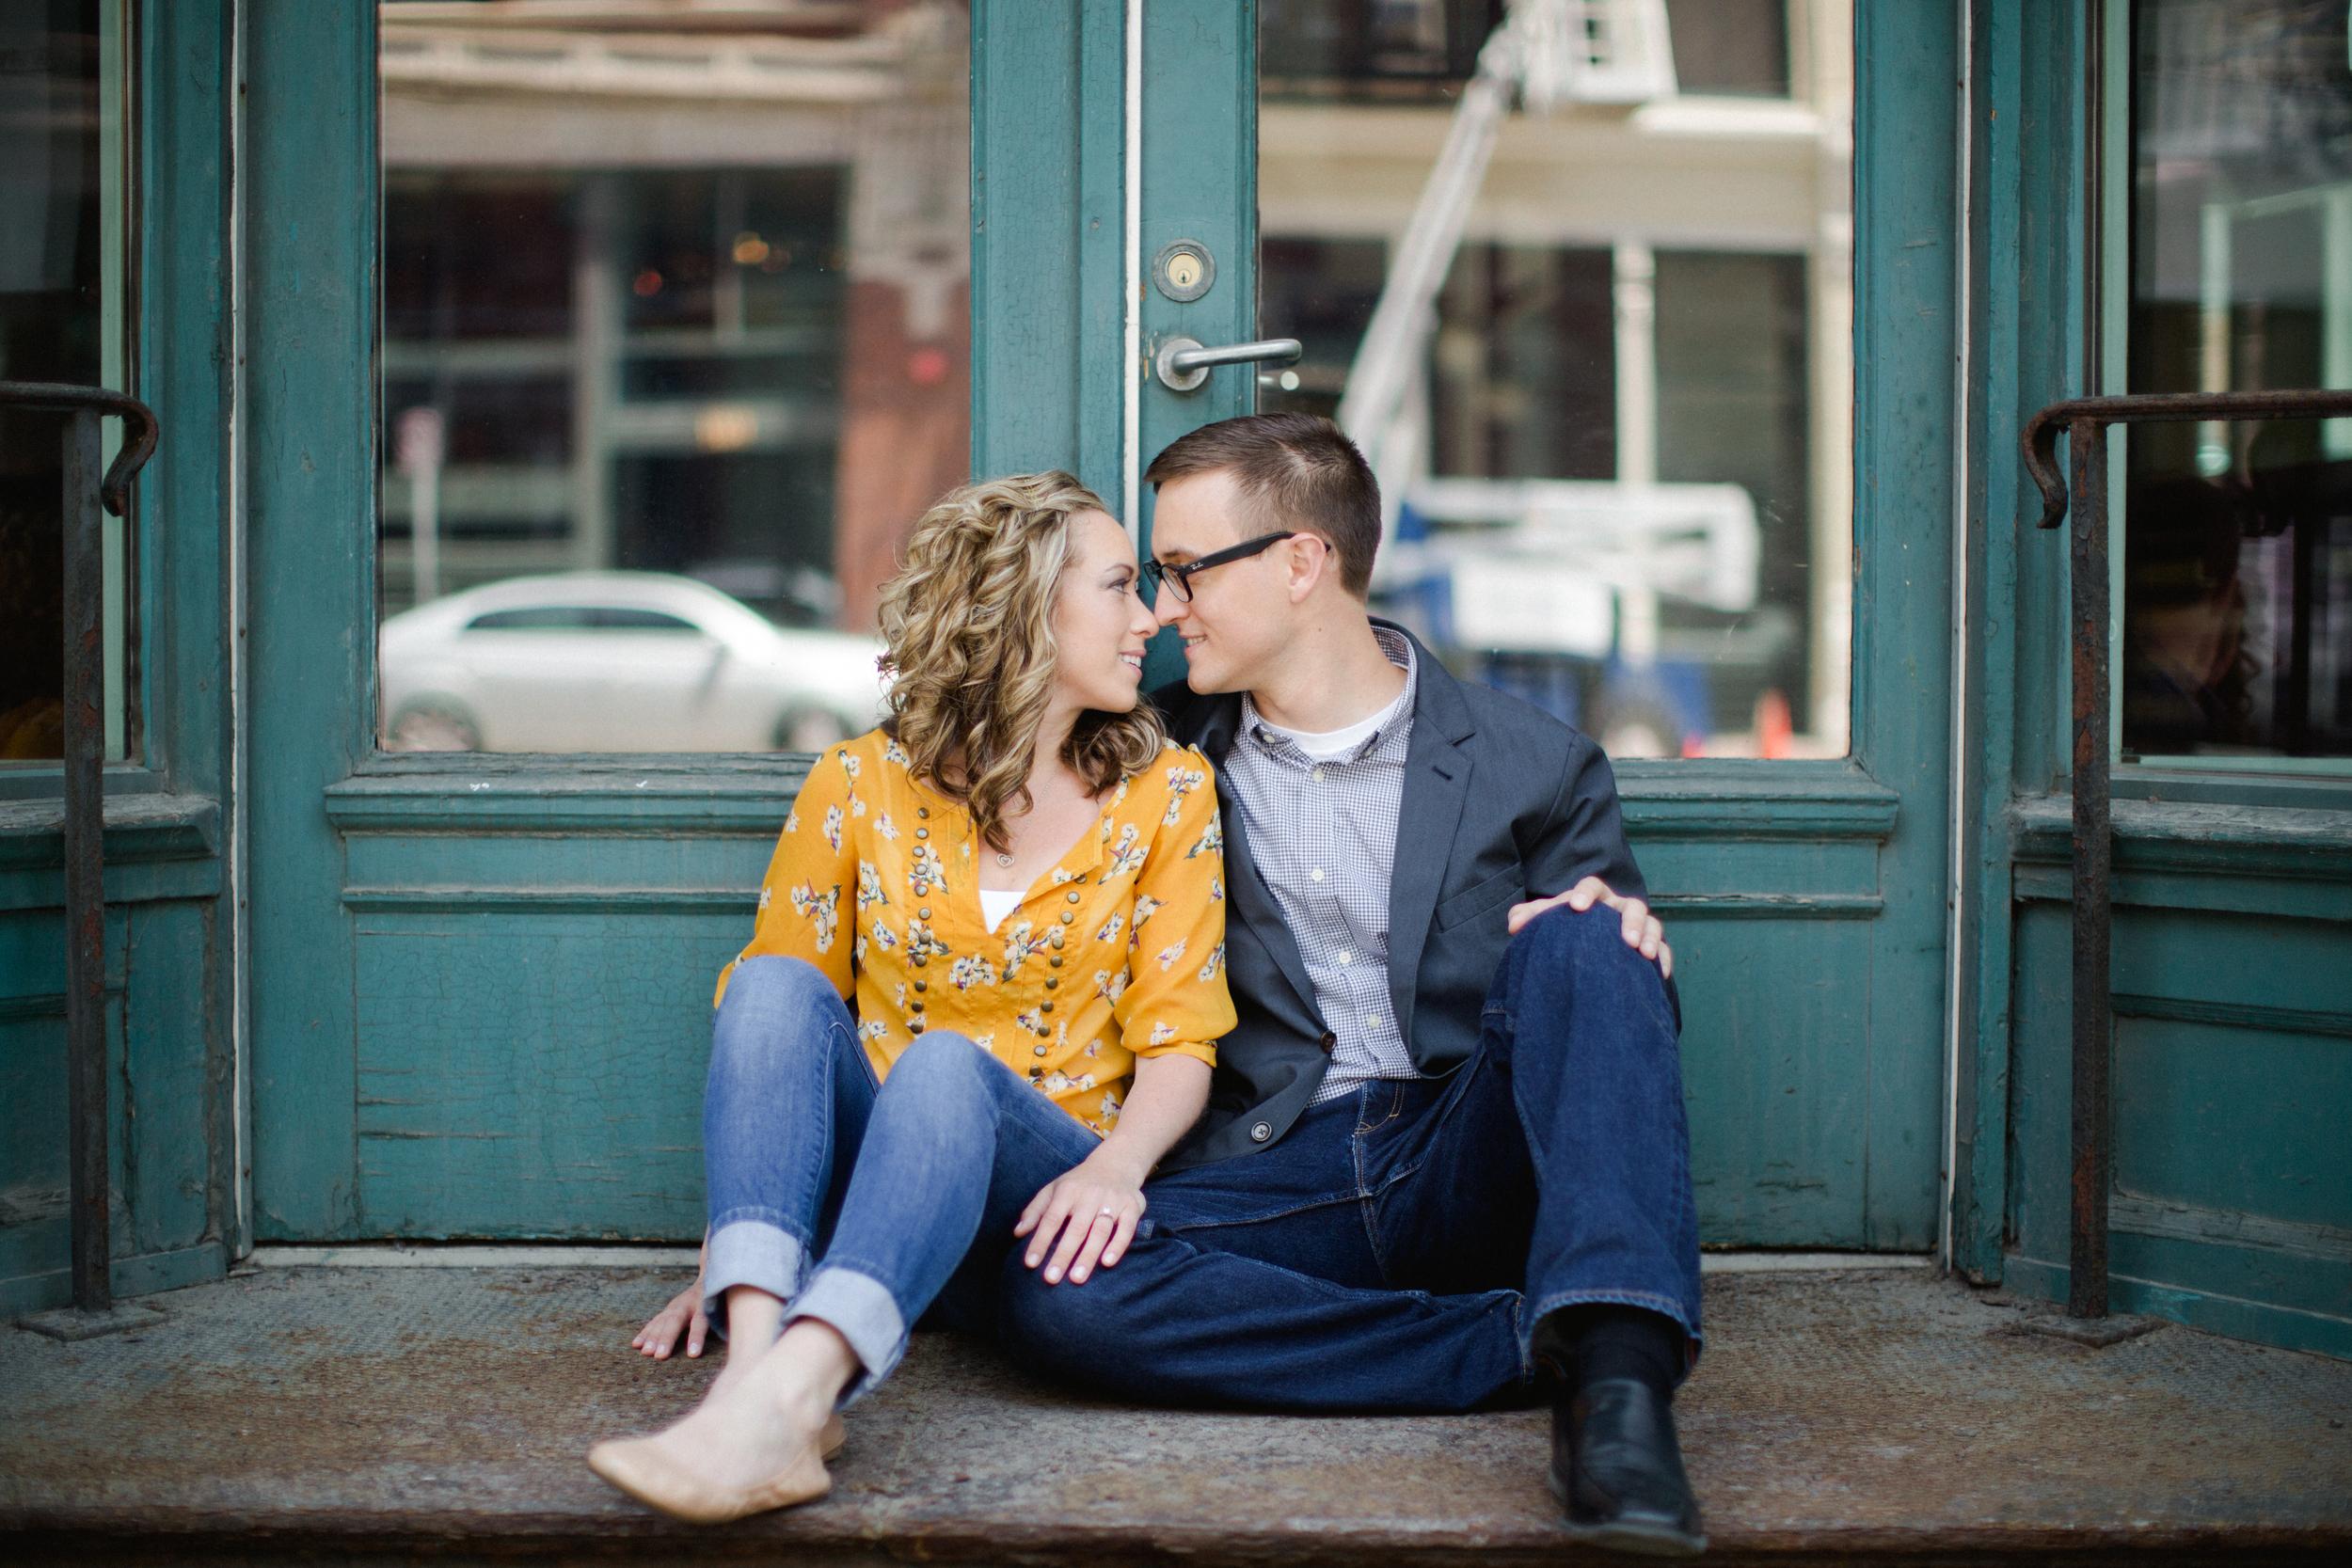 Ashley & Valera Smokvin, Married October 11, 2014 in Milwaukee, WI